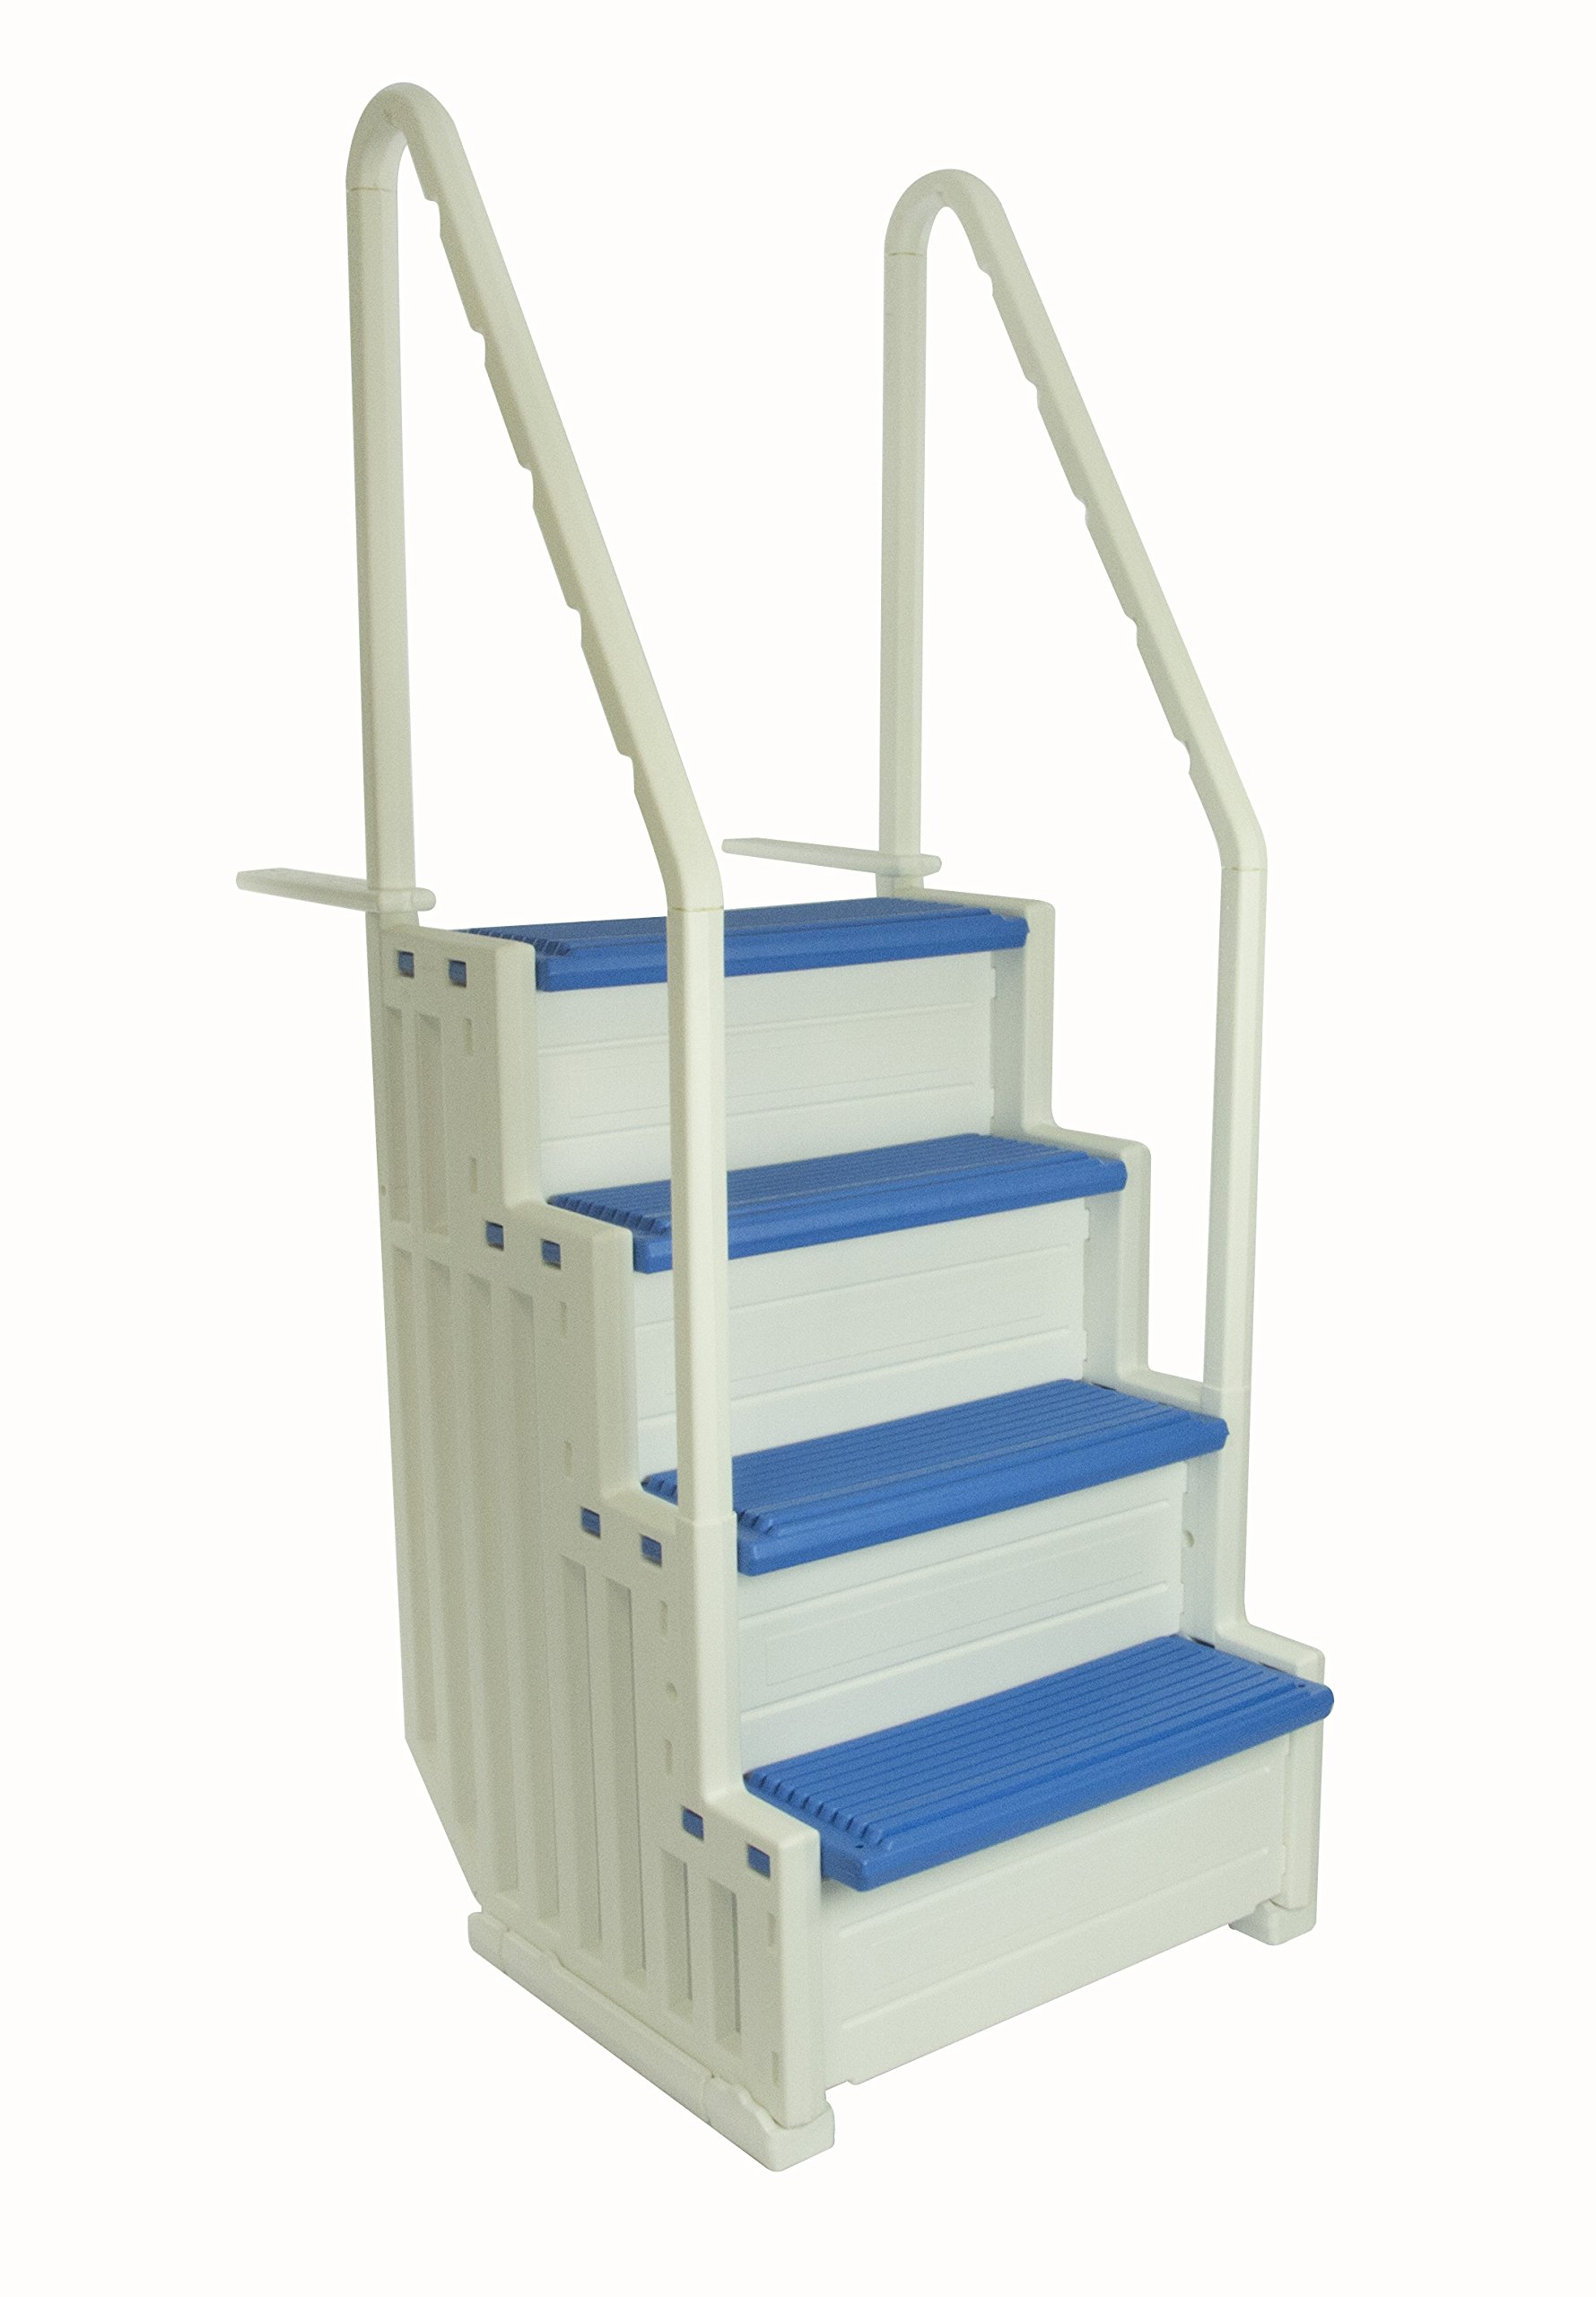 Best Rated In Pool Ladders Amp Helpful Customer Reviews